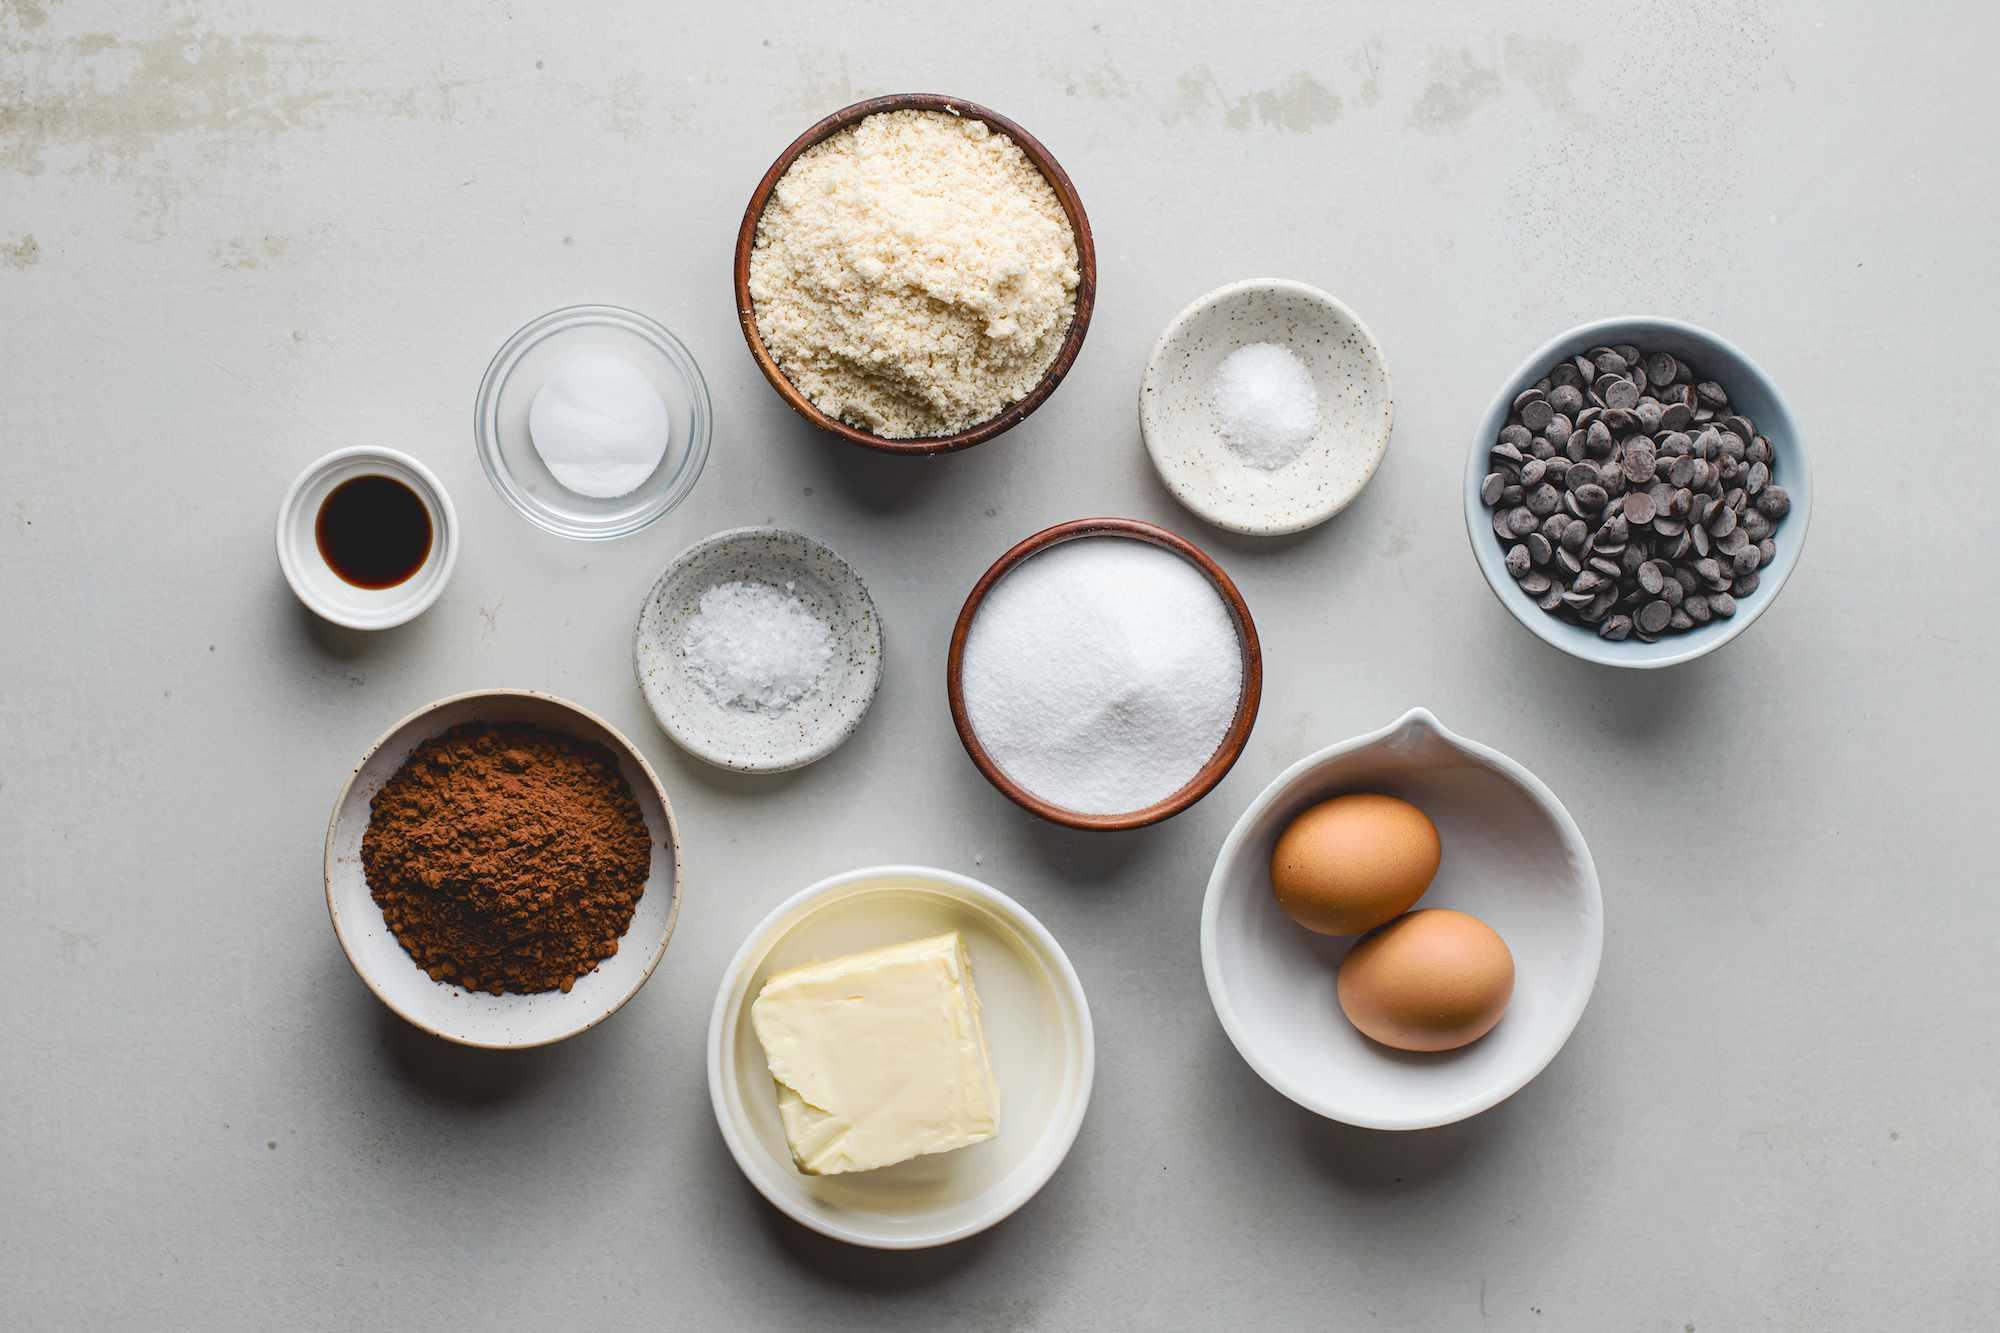 Ingredients for keto chocolate cookies